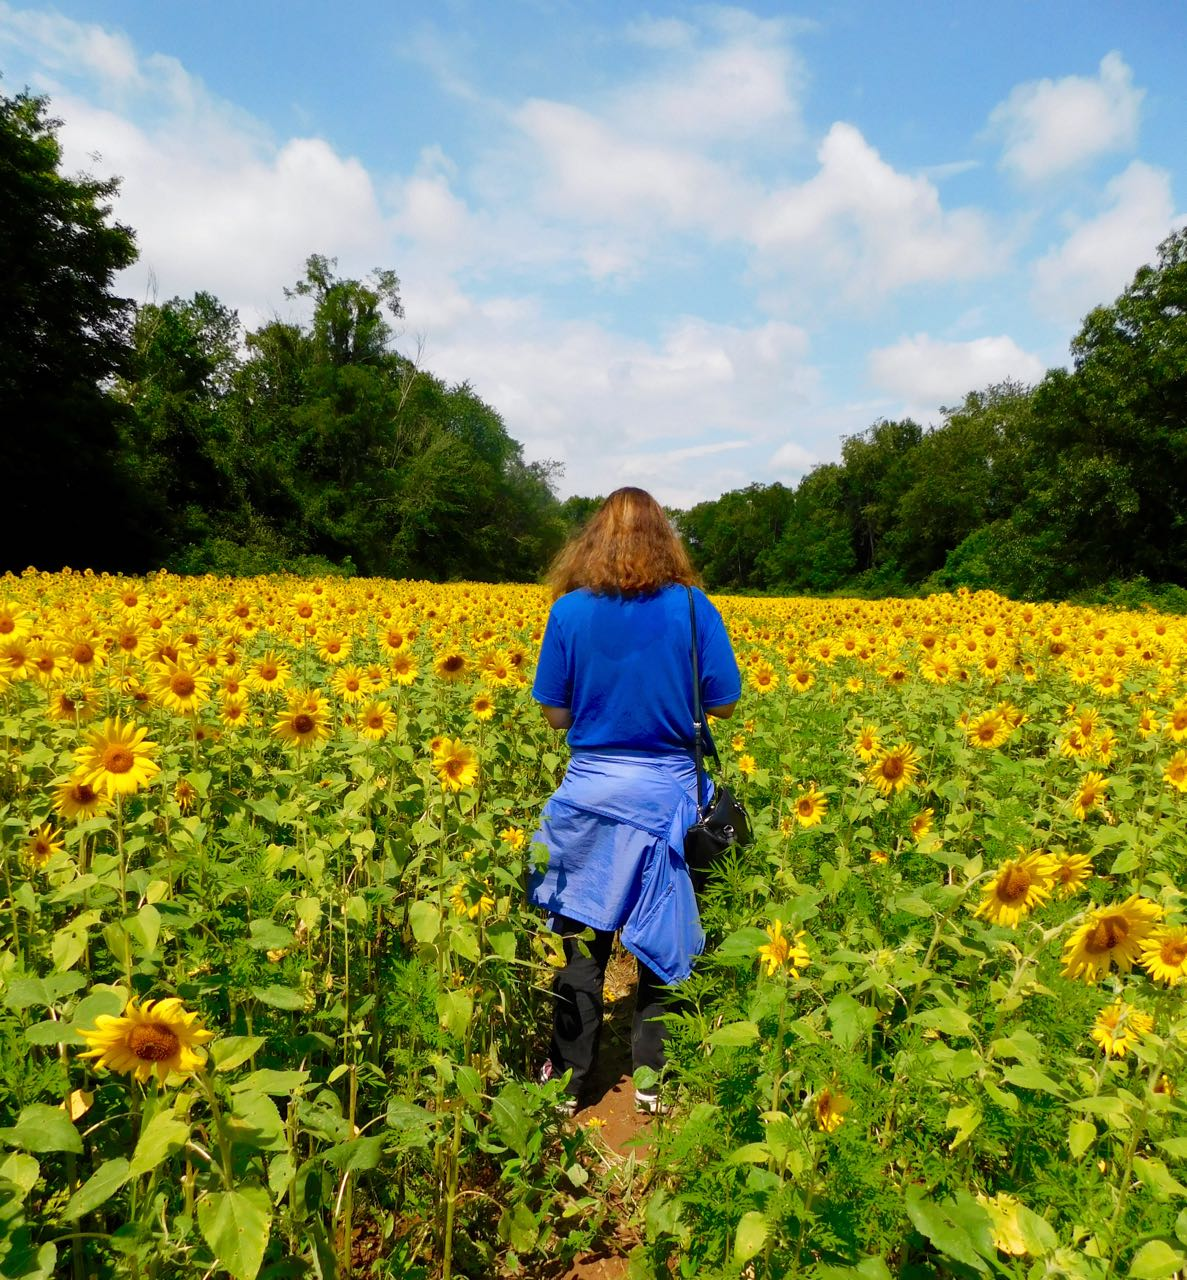 Woman at Peak Sunflower Bloom